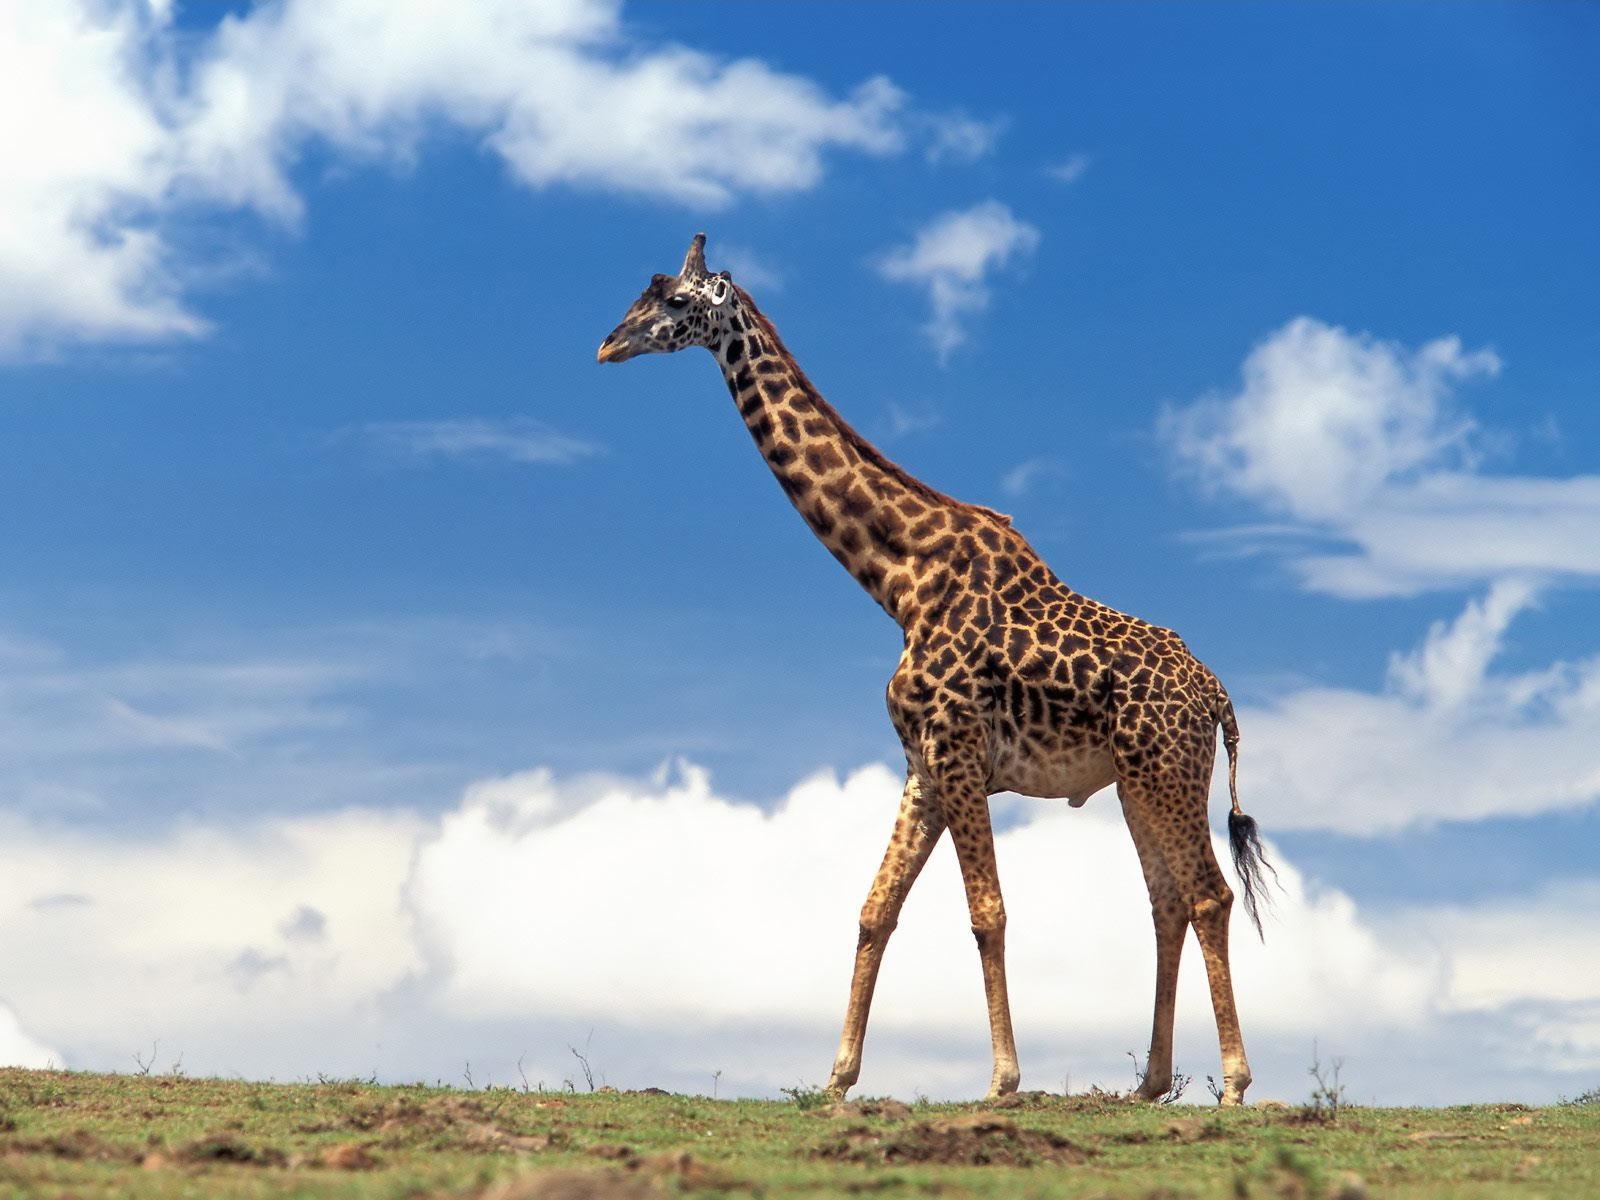 http://3.bp.blogspot.com/-v42R8FlcDIQ/T2Qw-lG1LiI/AAAAAAAABvw/kHDyhguu0mw/s1600/giraffe+19.jpg